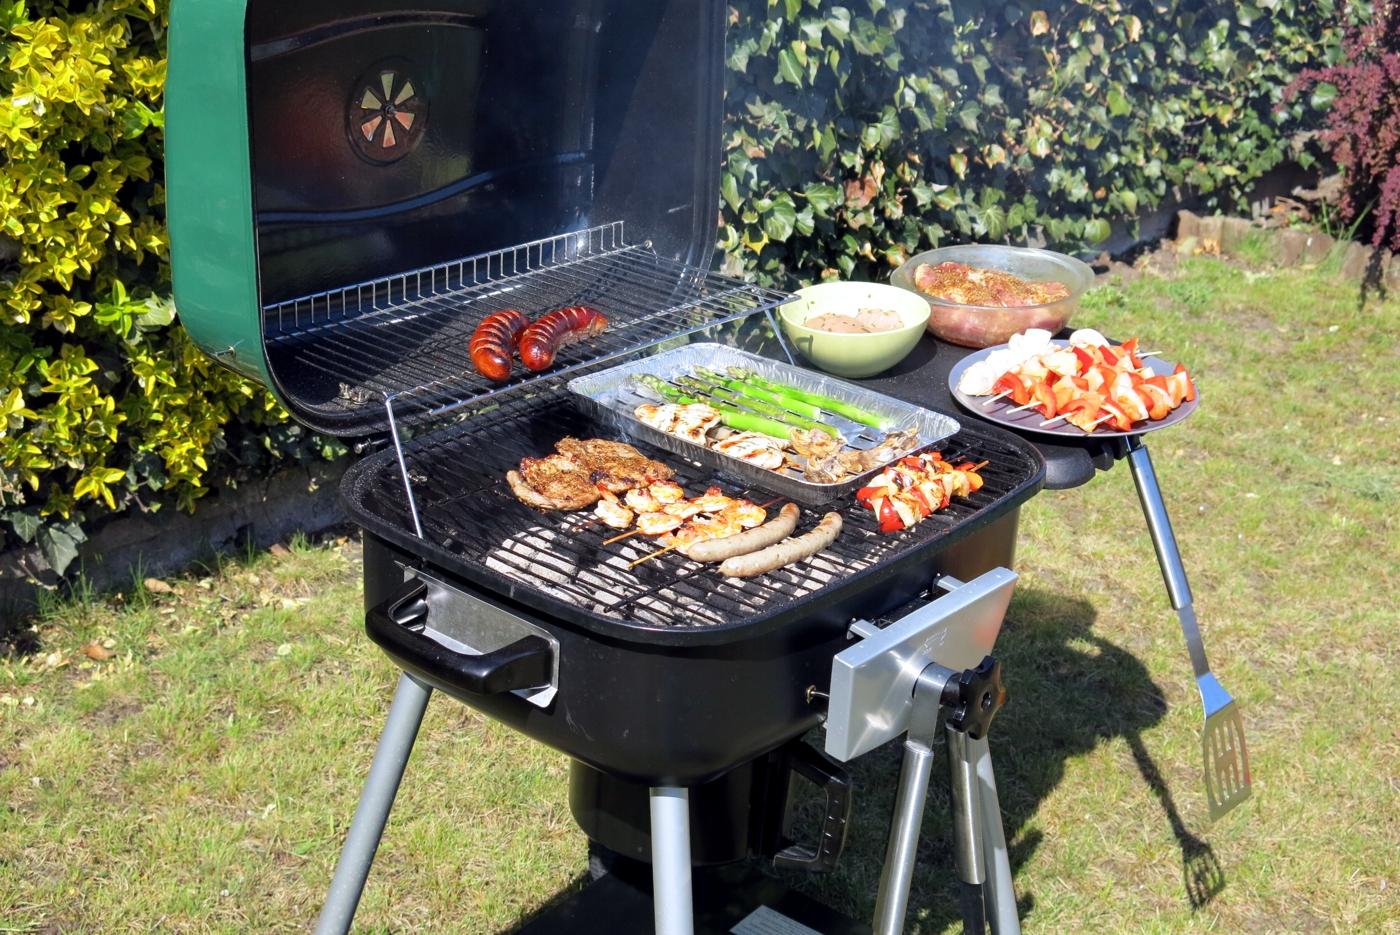 Test grilla w glowego blooma robson hw b2020b castorama moje opinie - Grille barbecue castorama ...